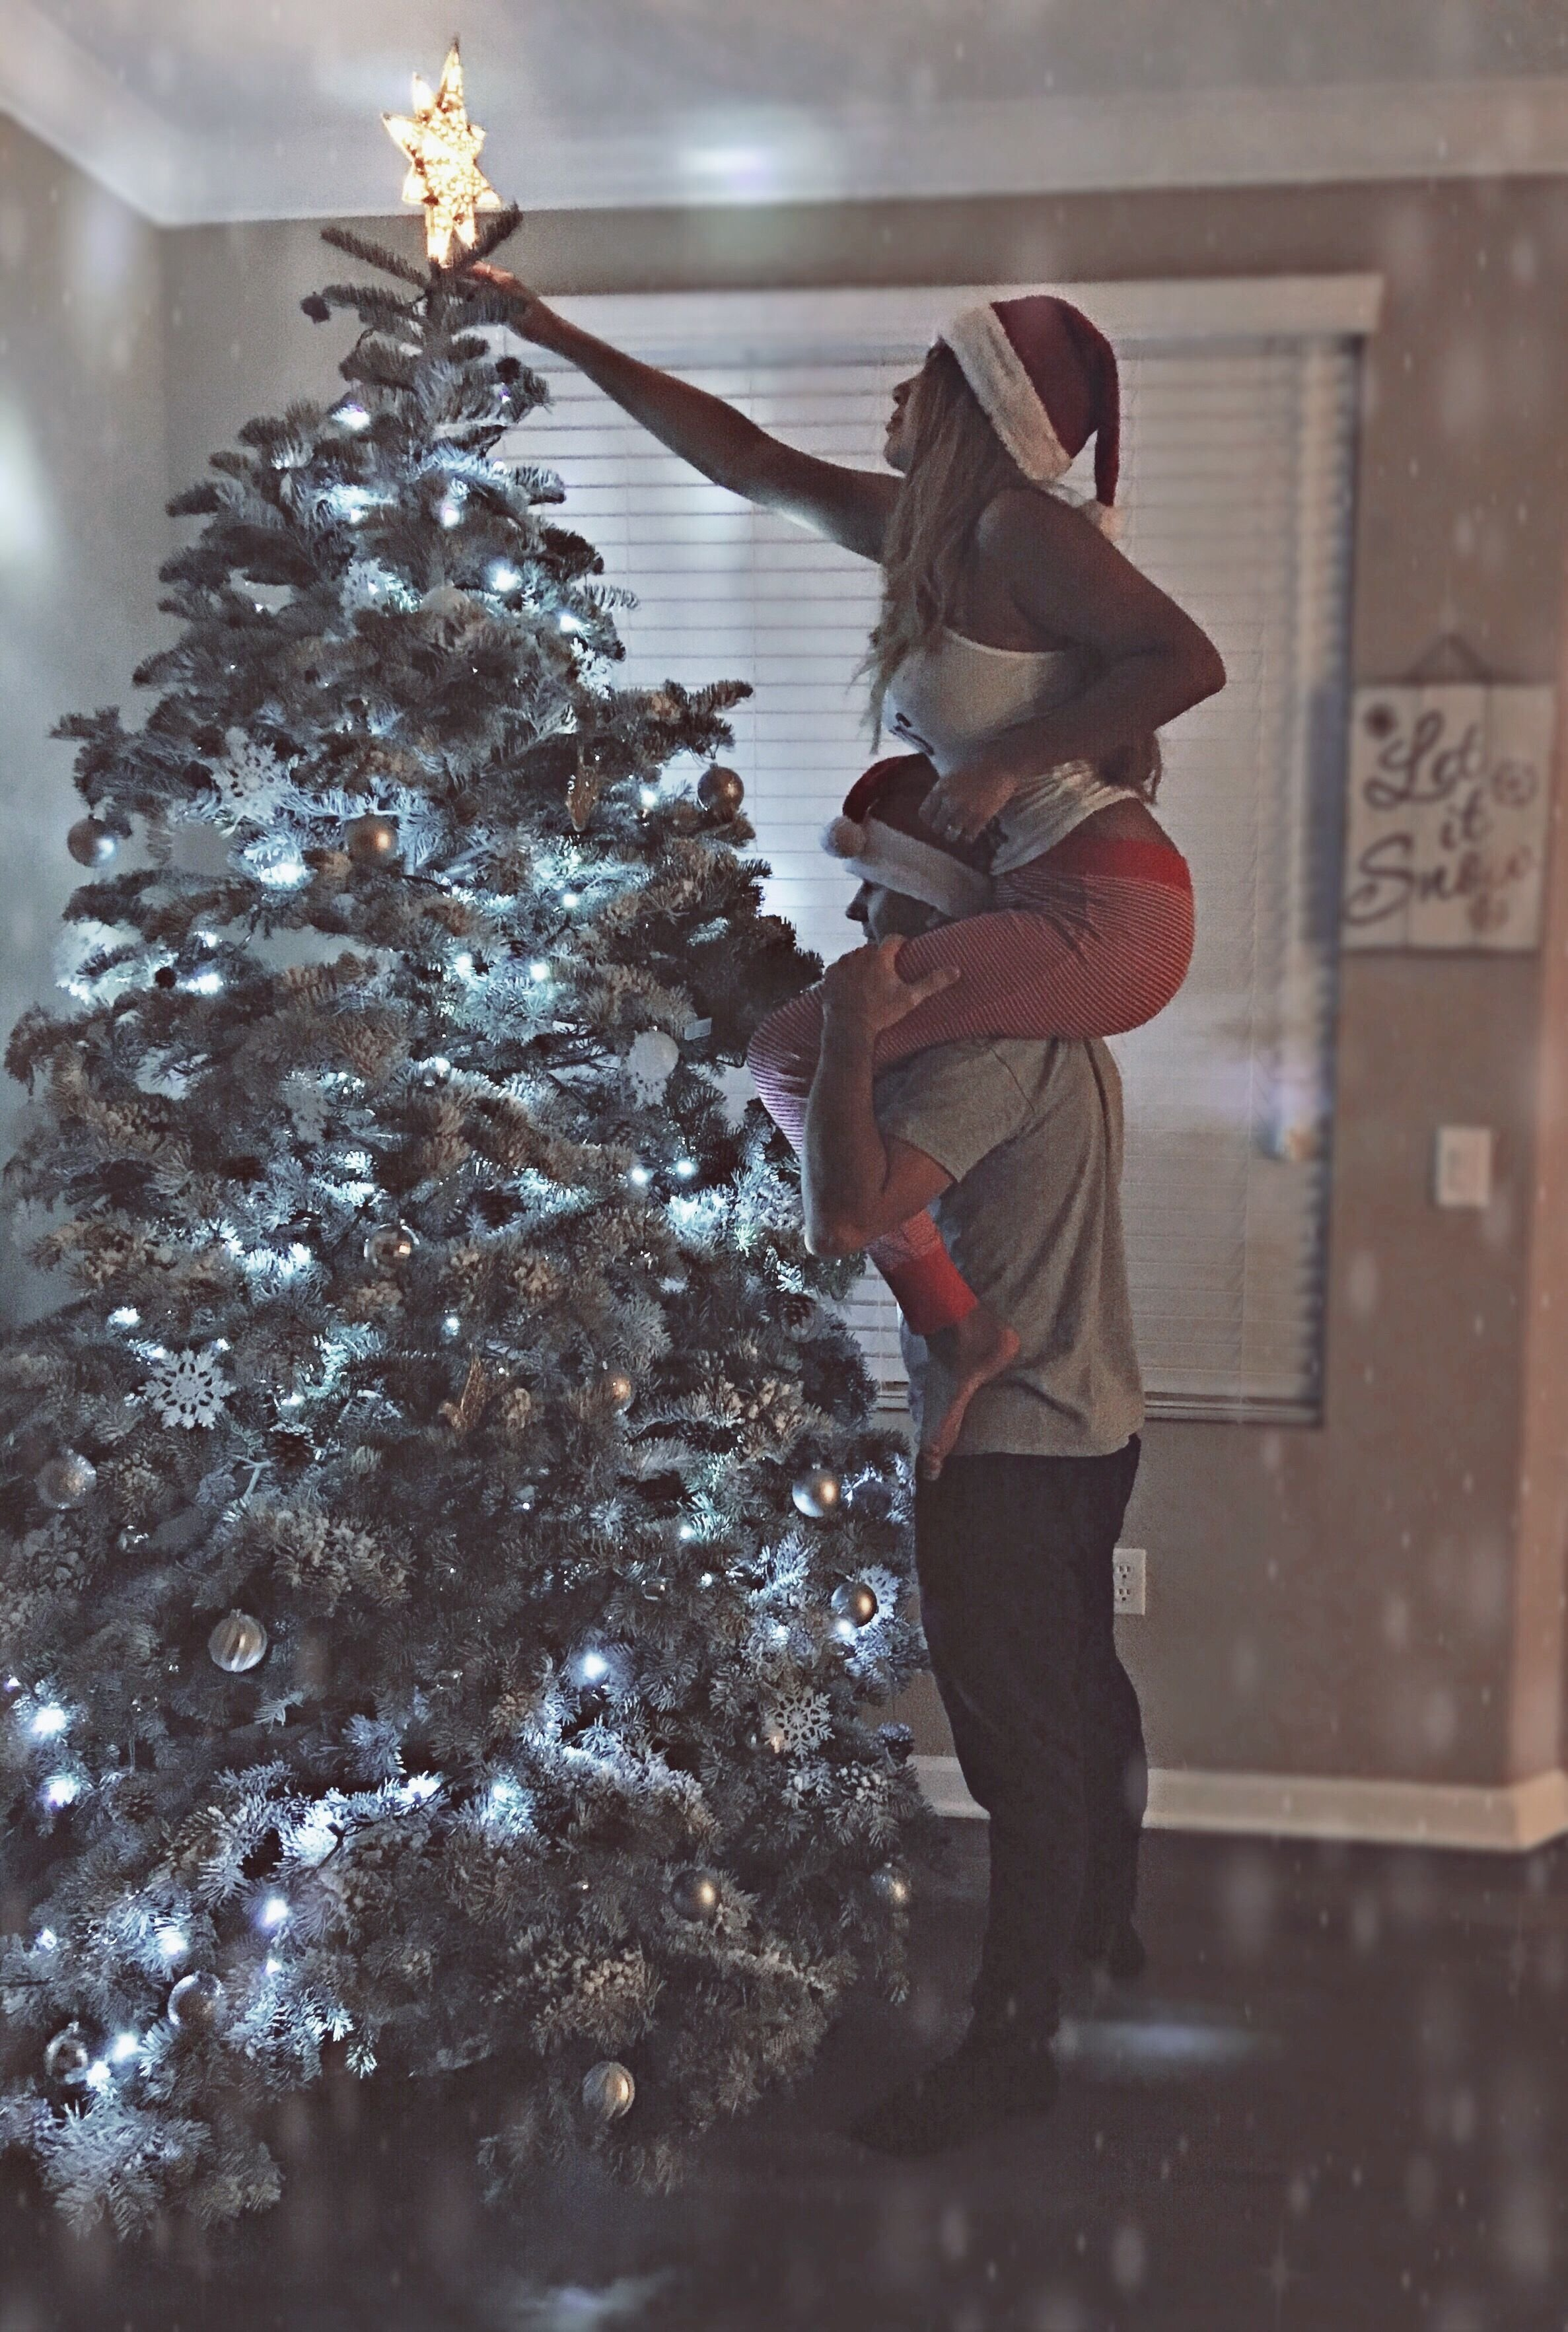 10 Wonderful Cute Couple Christmas Picture Ideas selenakulikovskiy danikkulikovskiy instagram couple goals photo 2 2020